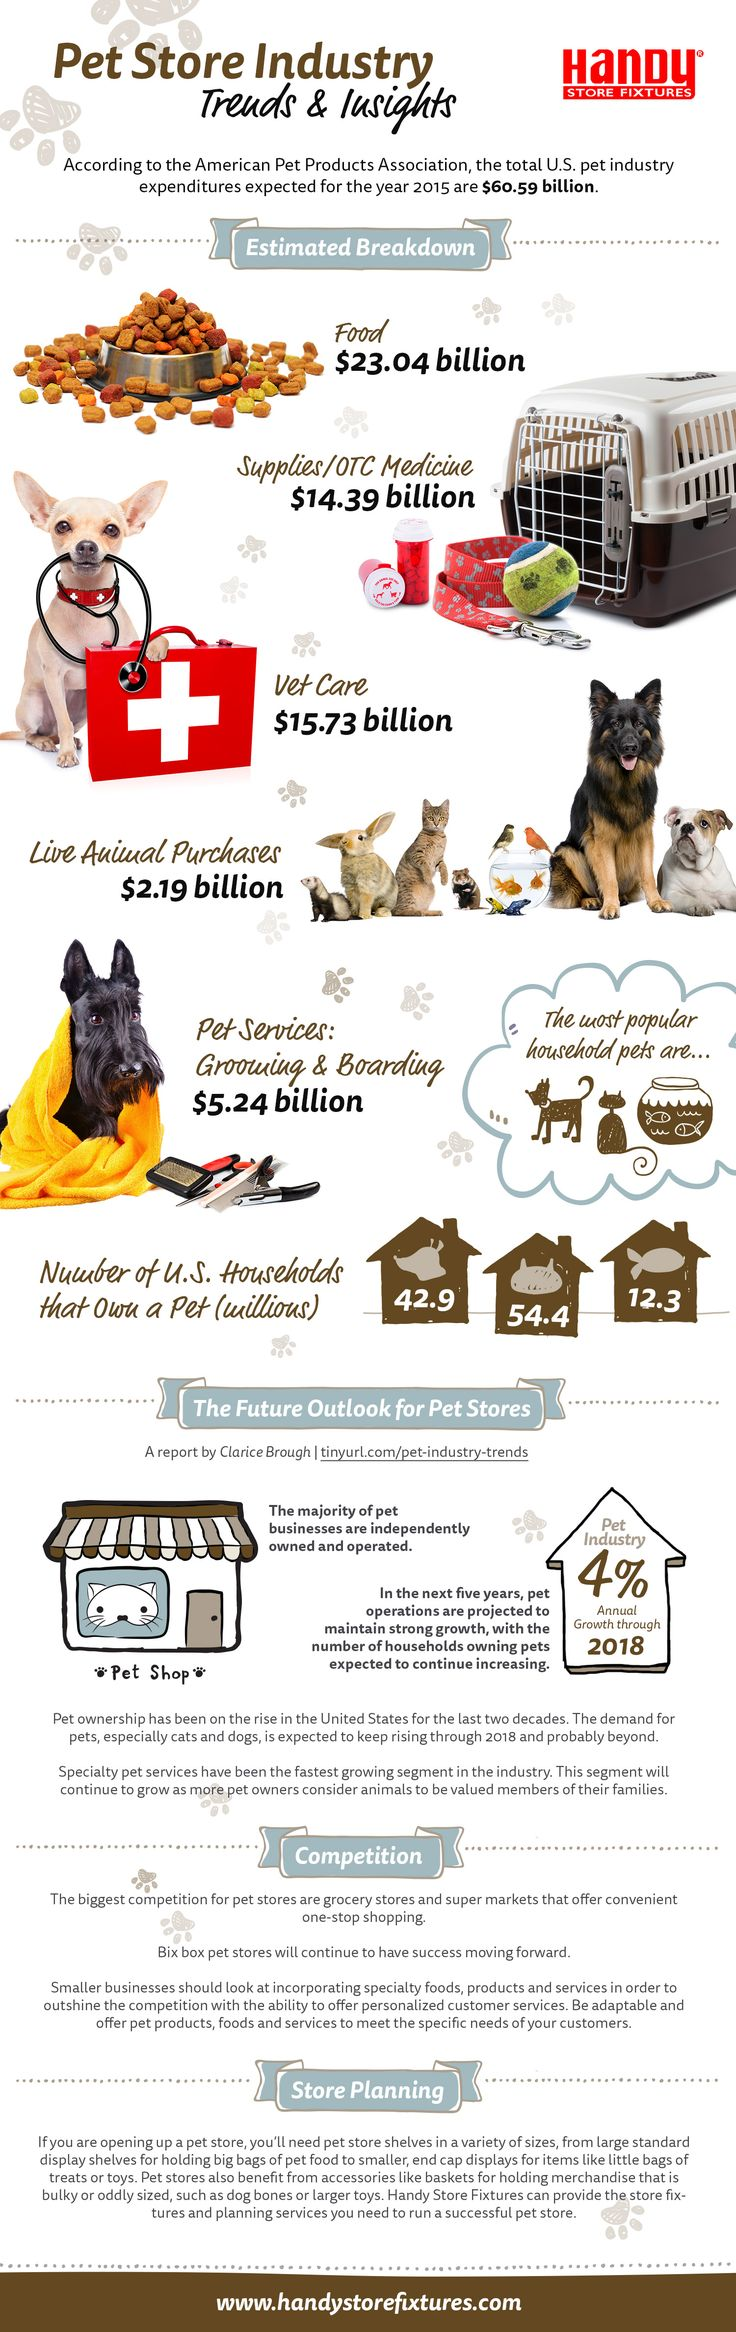 69 best Pet Store Shelving images on Pinterest